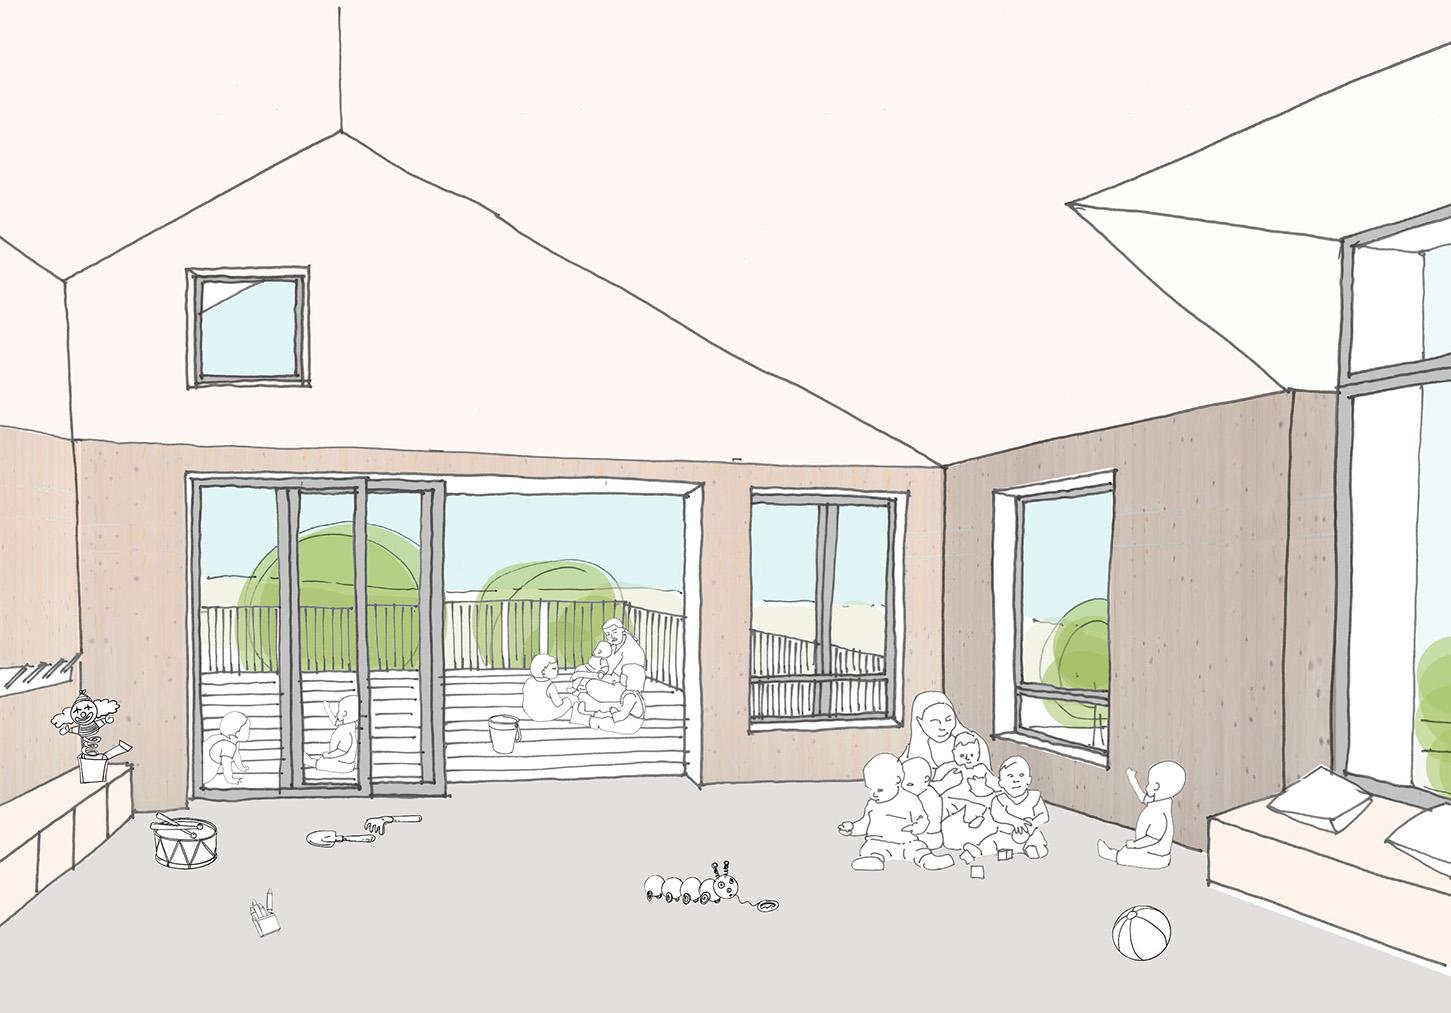 Sarah-Wigglesworth-Architects Portland-Nursery Internal-View-2 1800-slide